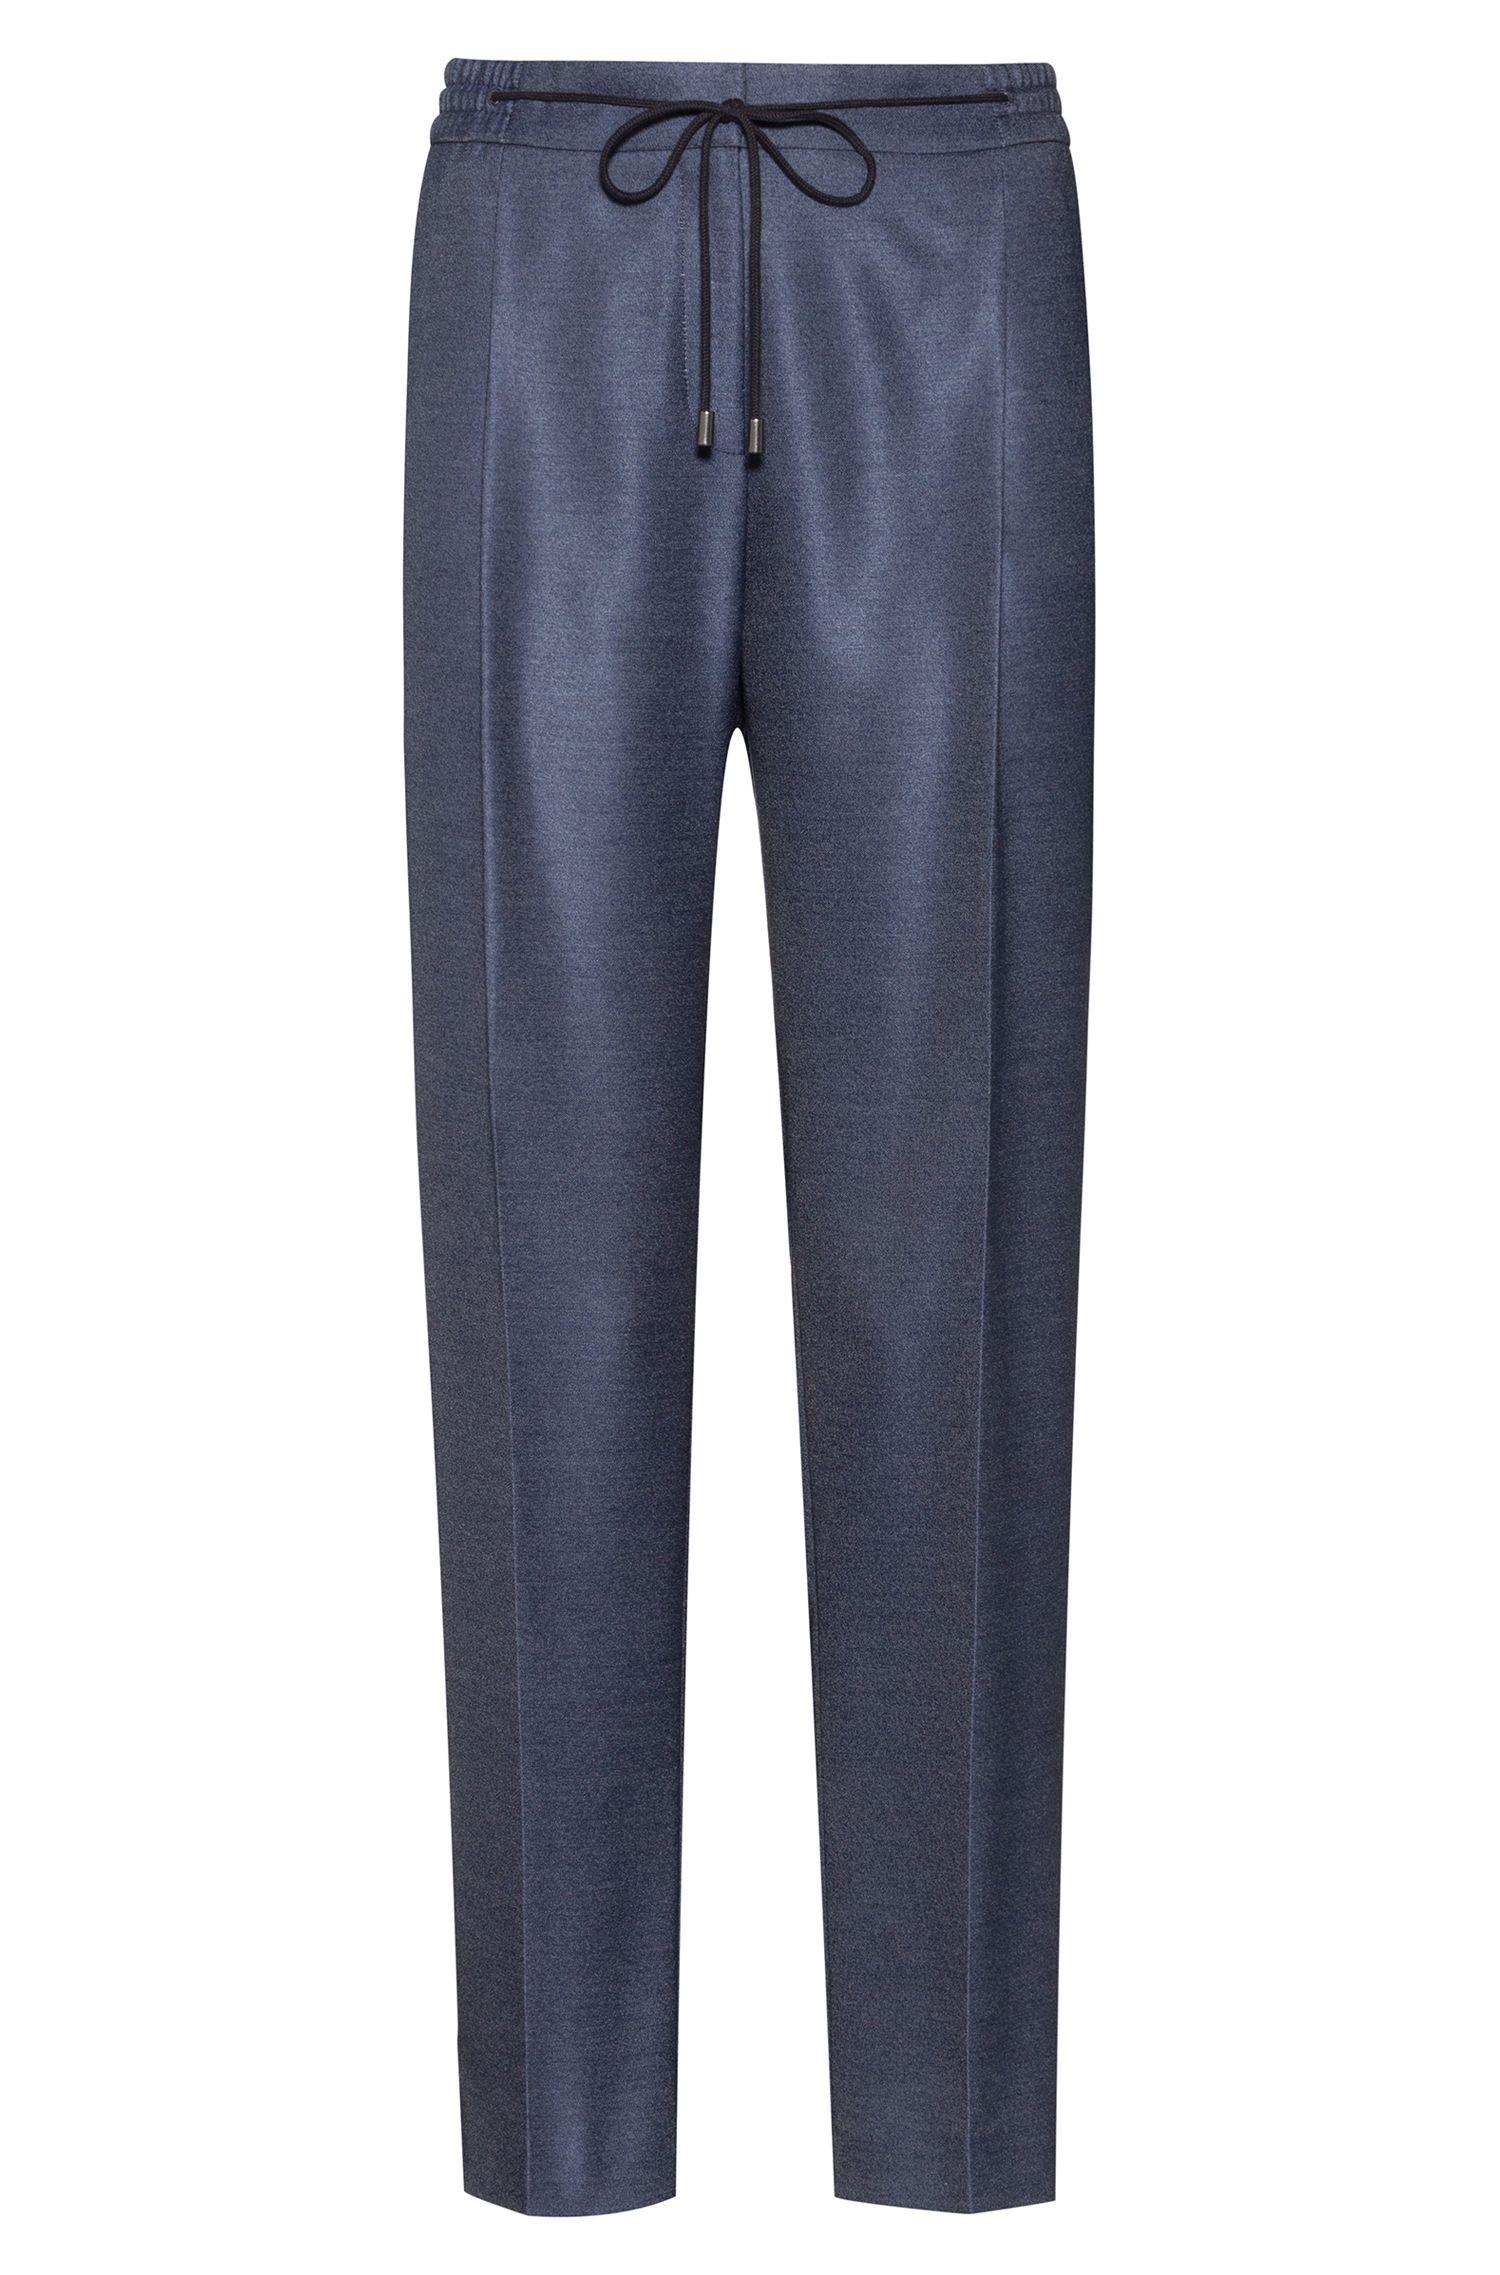 Hugo Boss - Pantalon Relaxed Fit en tissu stretch à taille avec cordon de serrage - 1